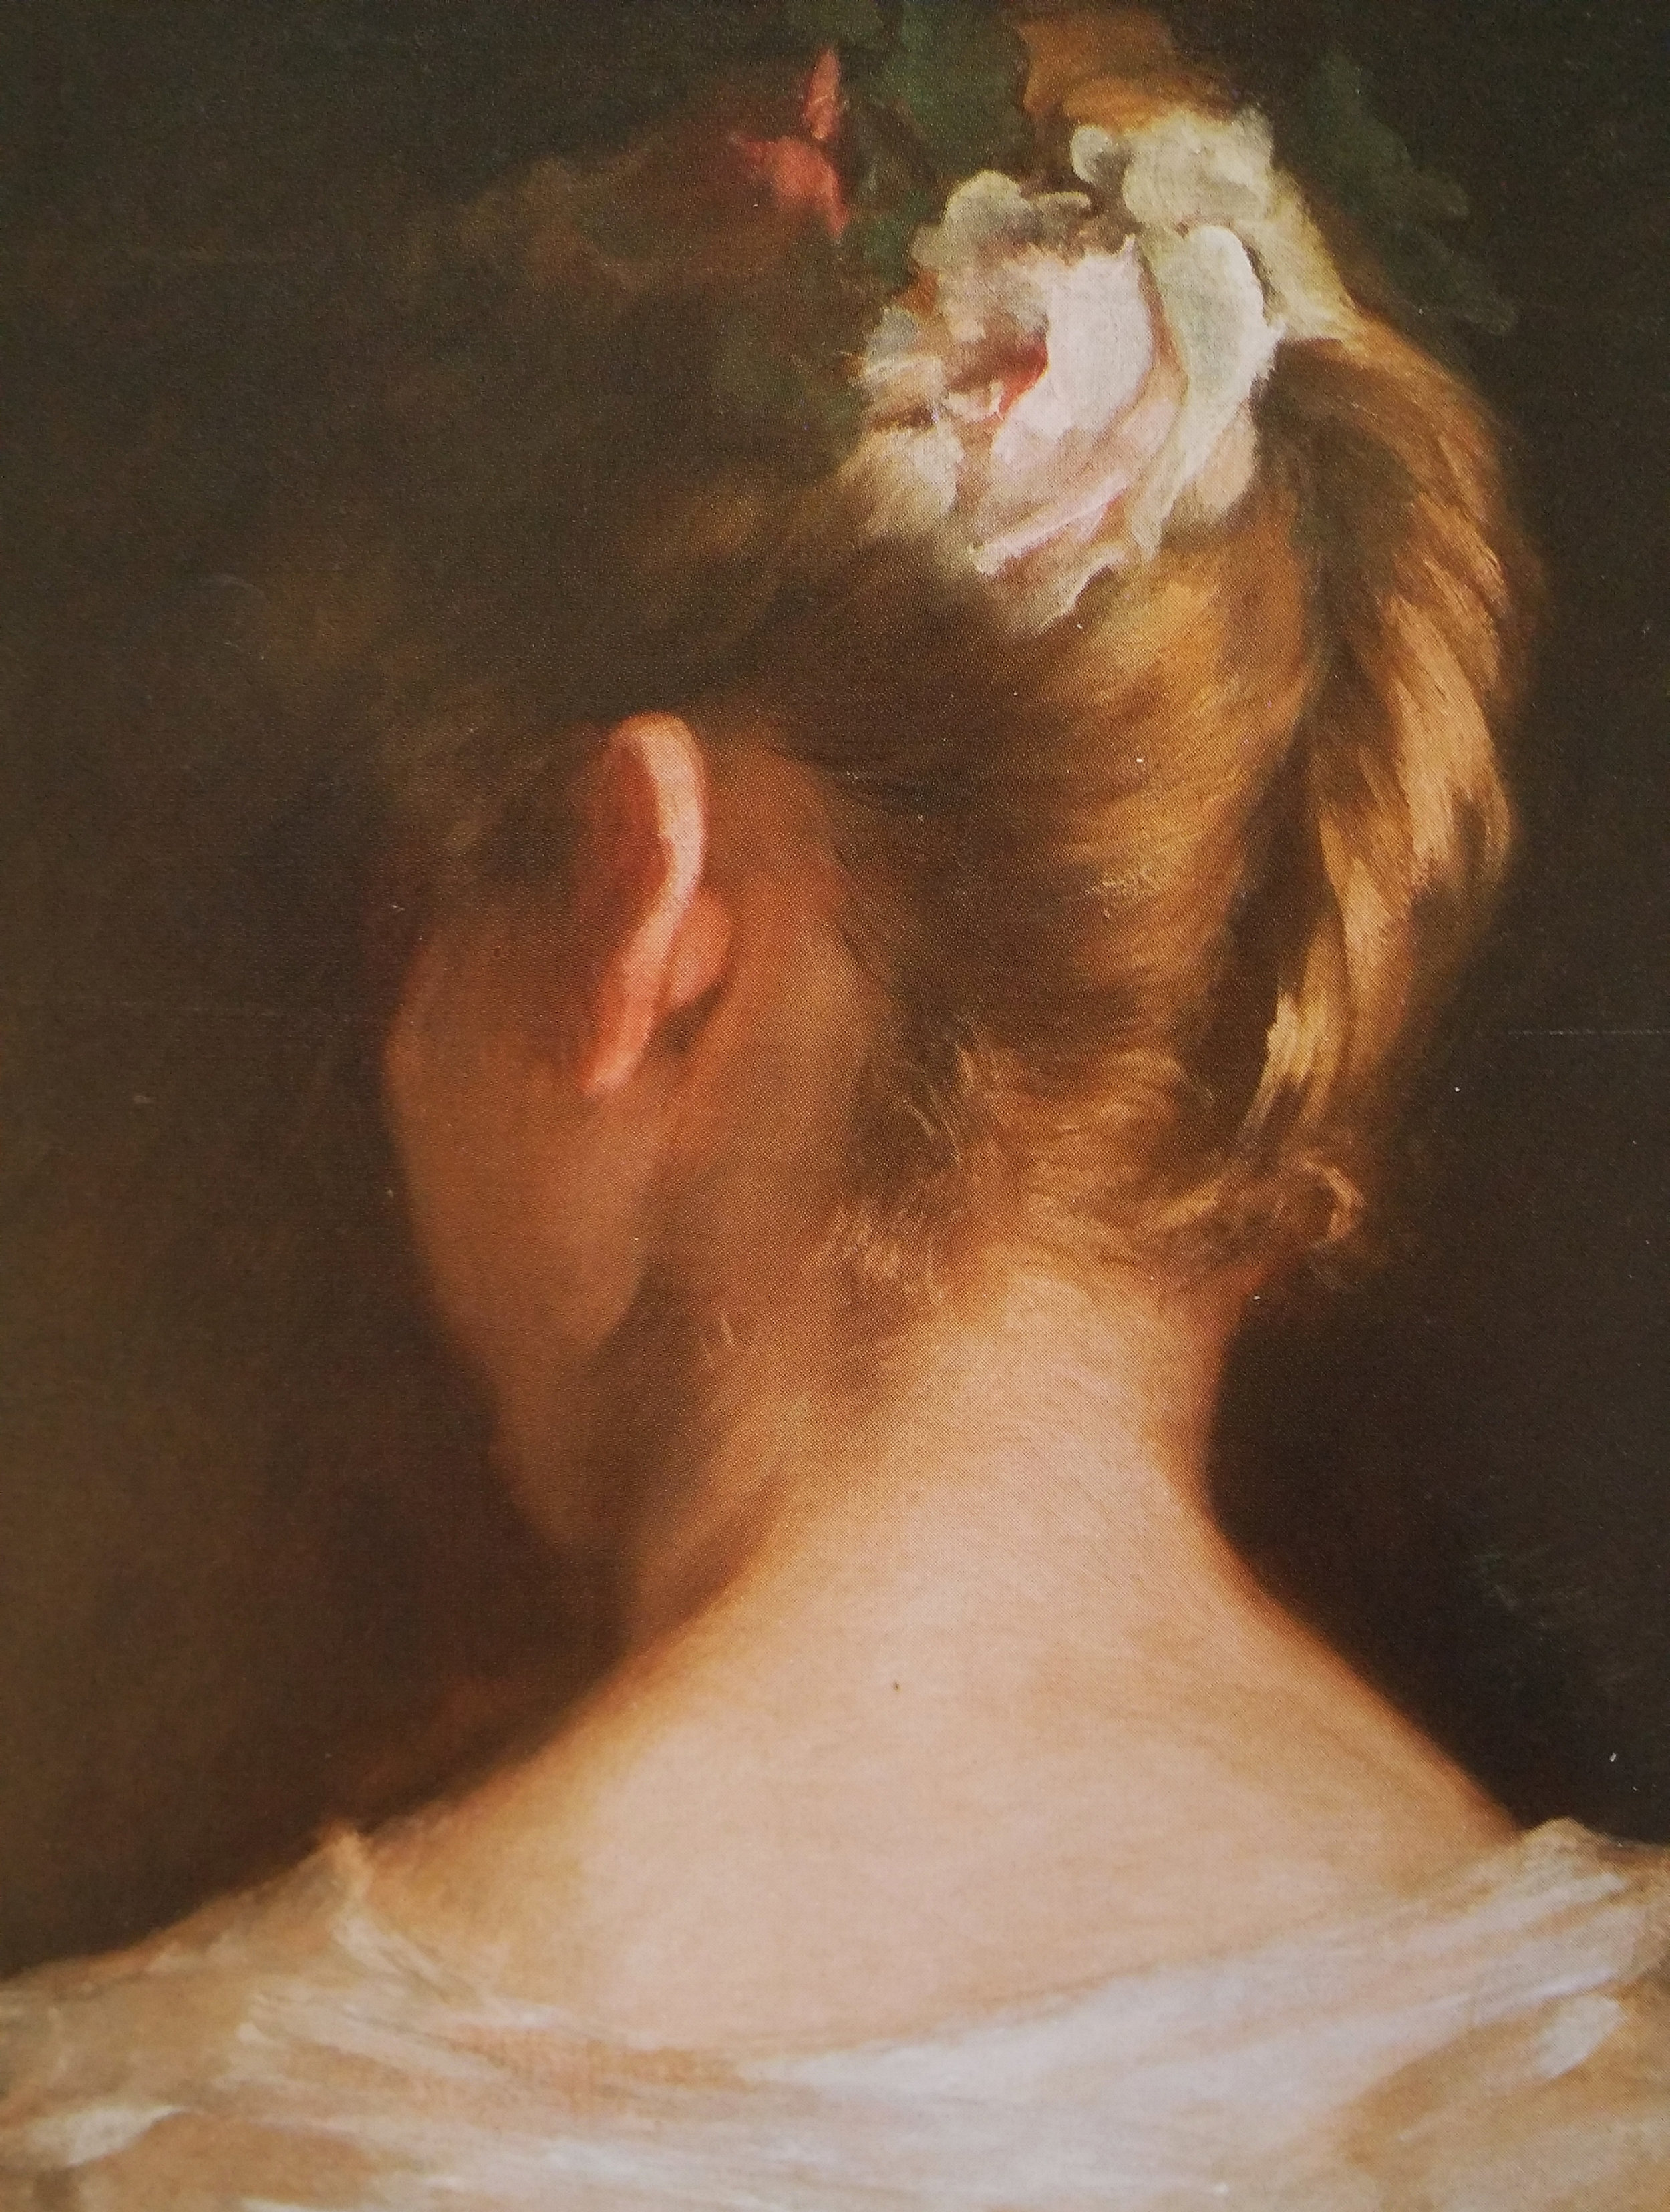 Female Study, Carolus-Duran, 1888, oil on canvas.